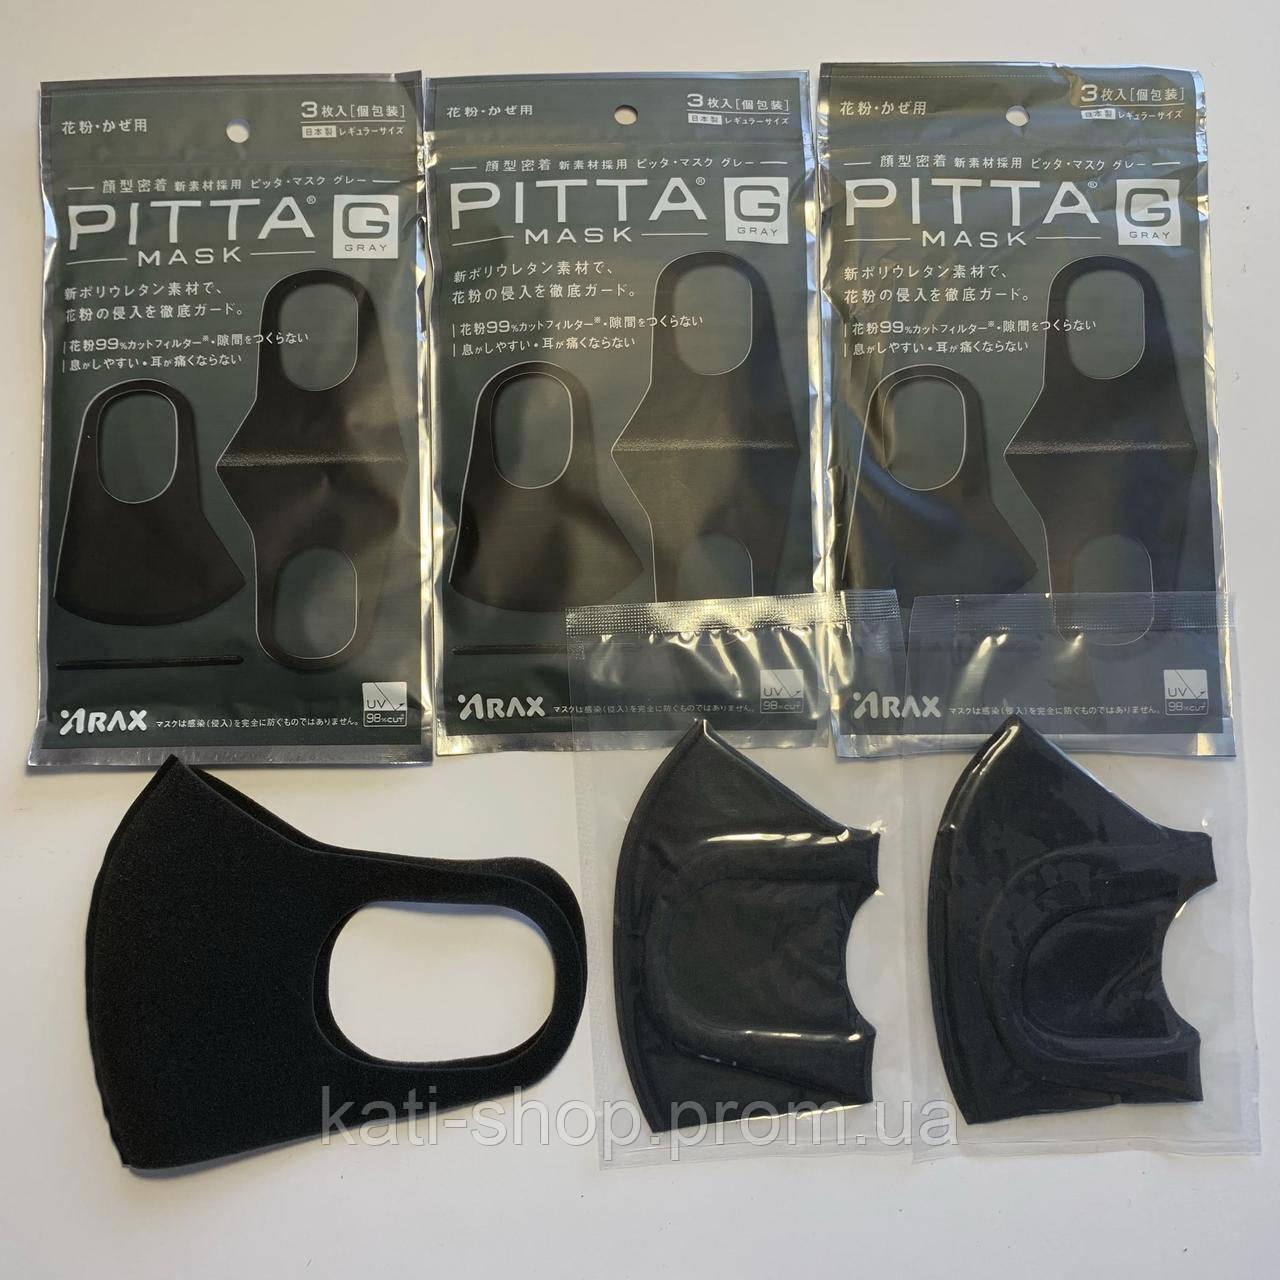 Многоразовая маска Pitta MASK Черная (эластичный полиуретан)